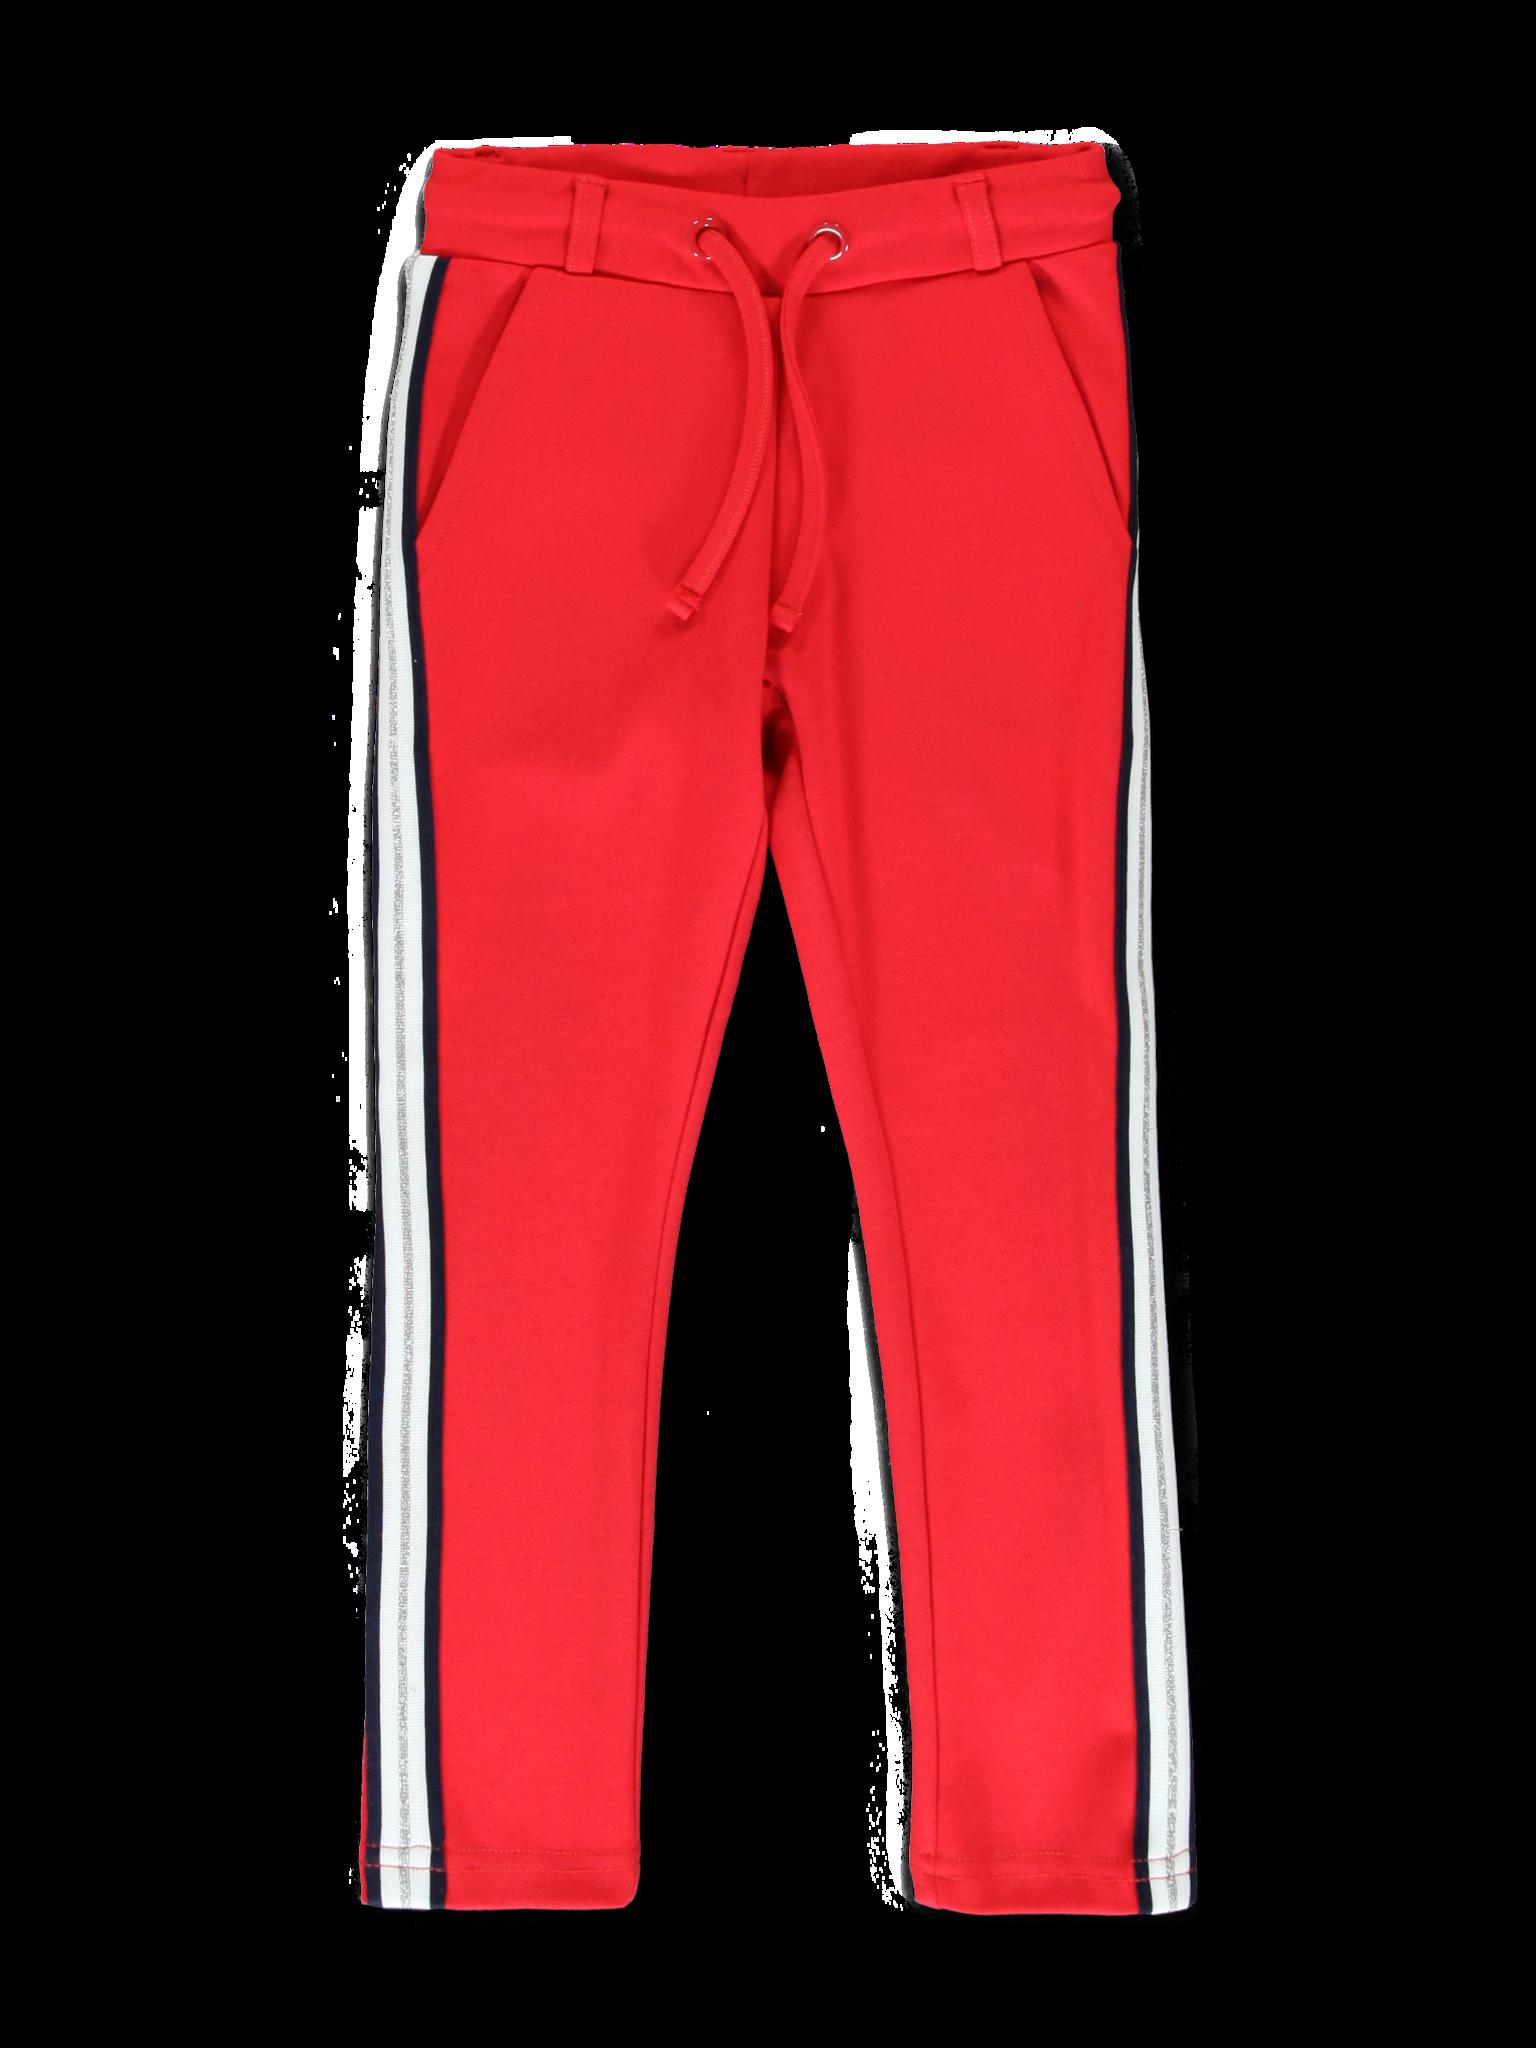 All Brands | Winterproducts Small Girls | Pants | 12 pcs/box